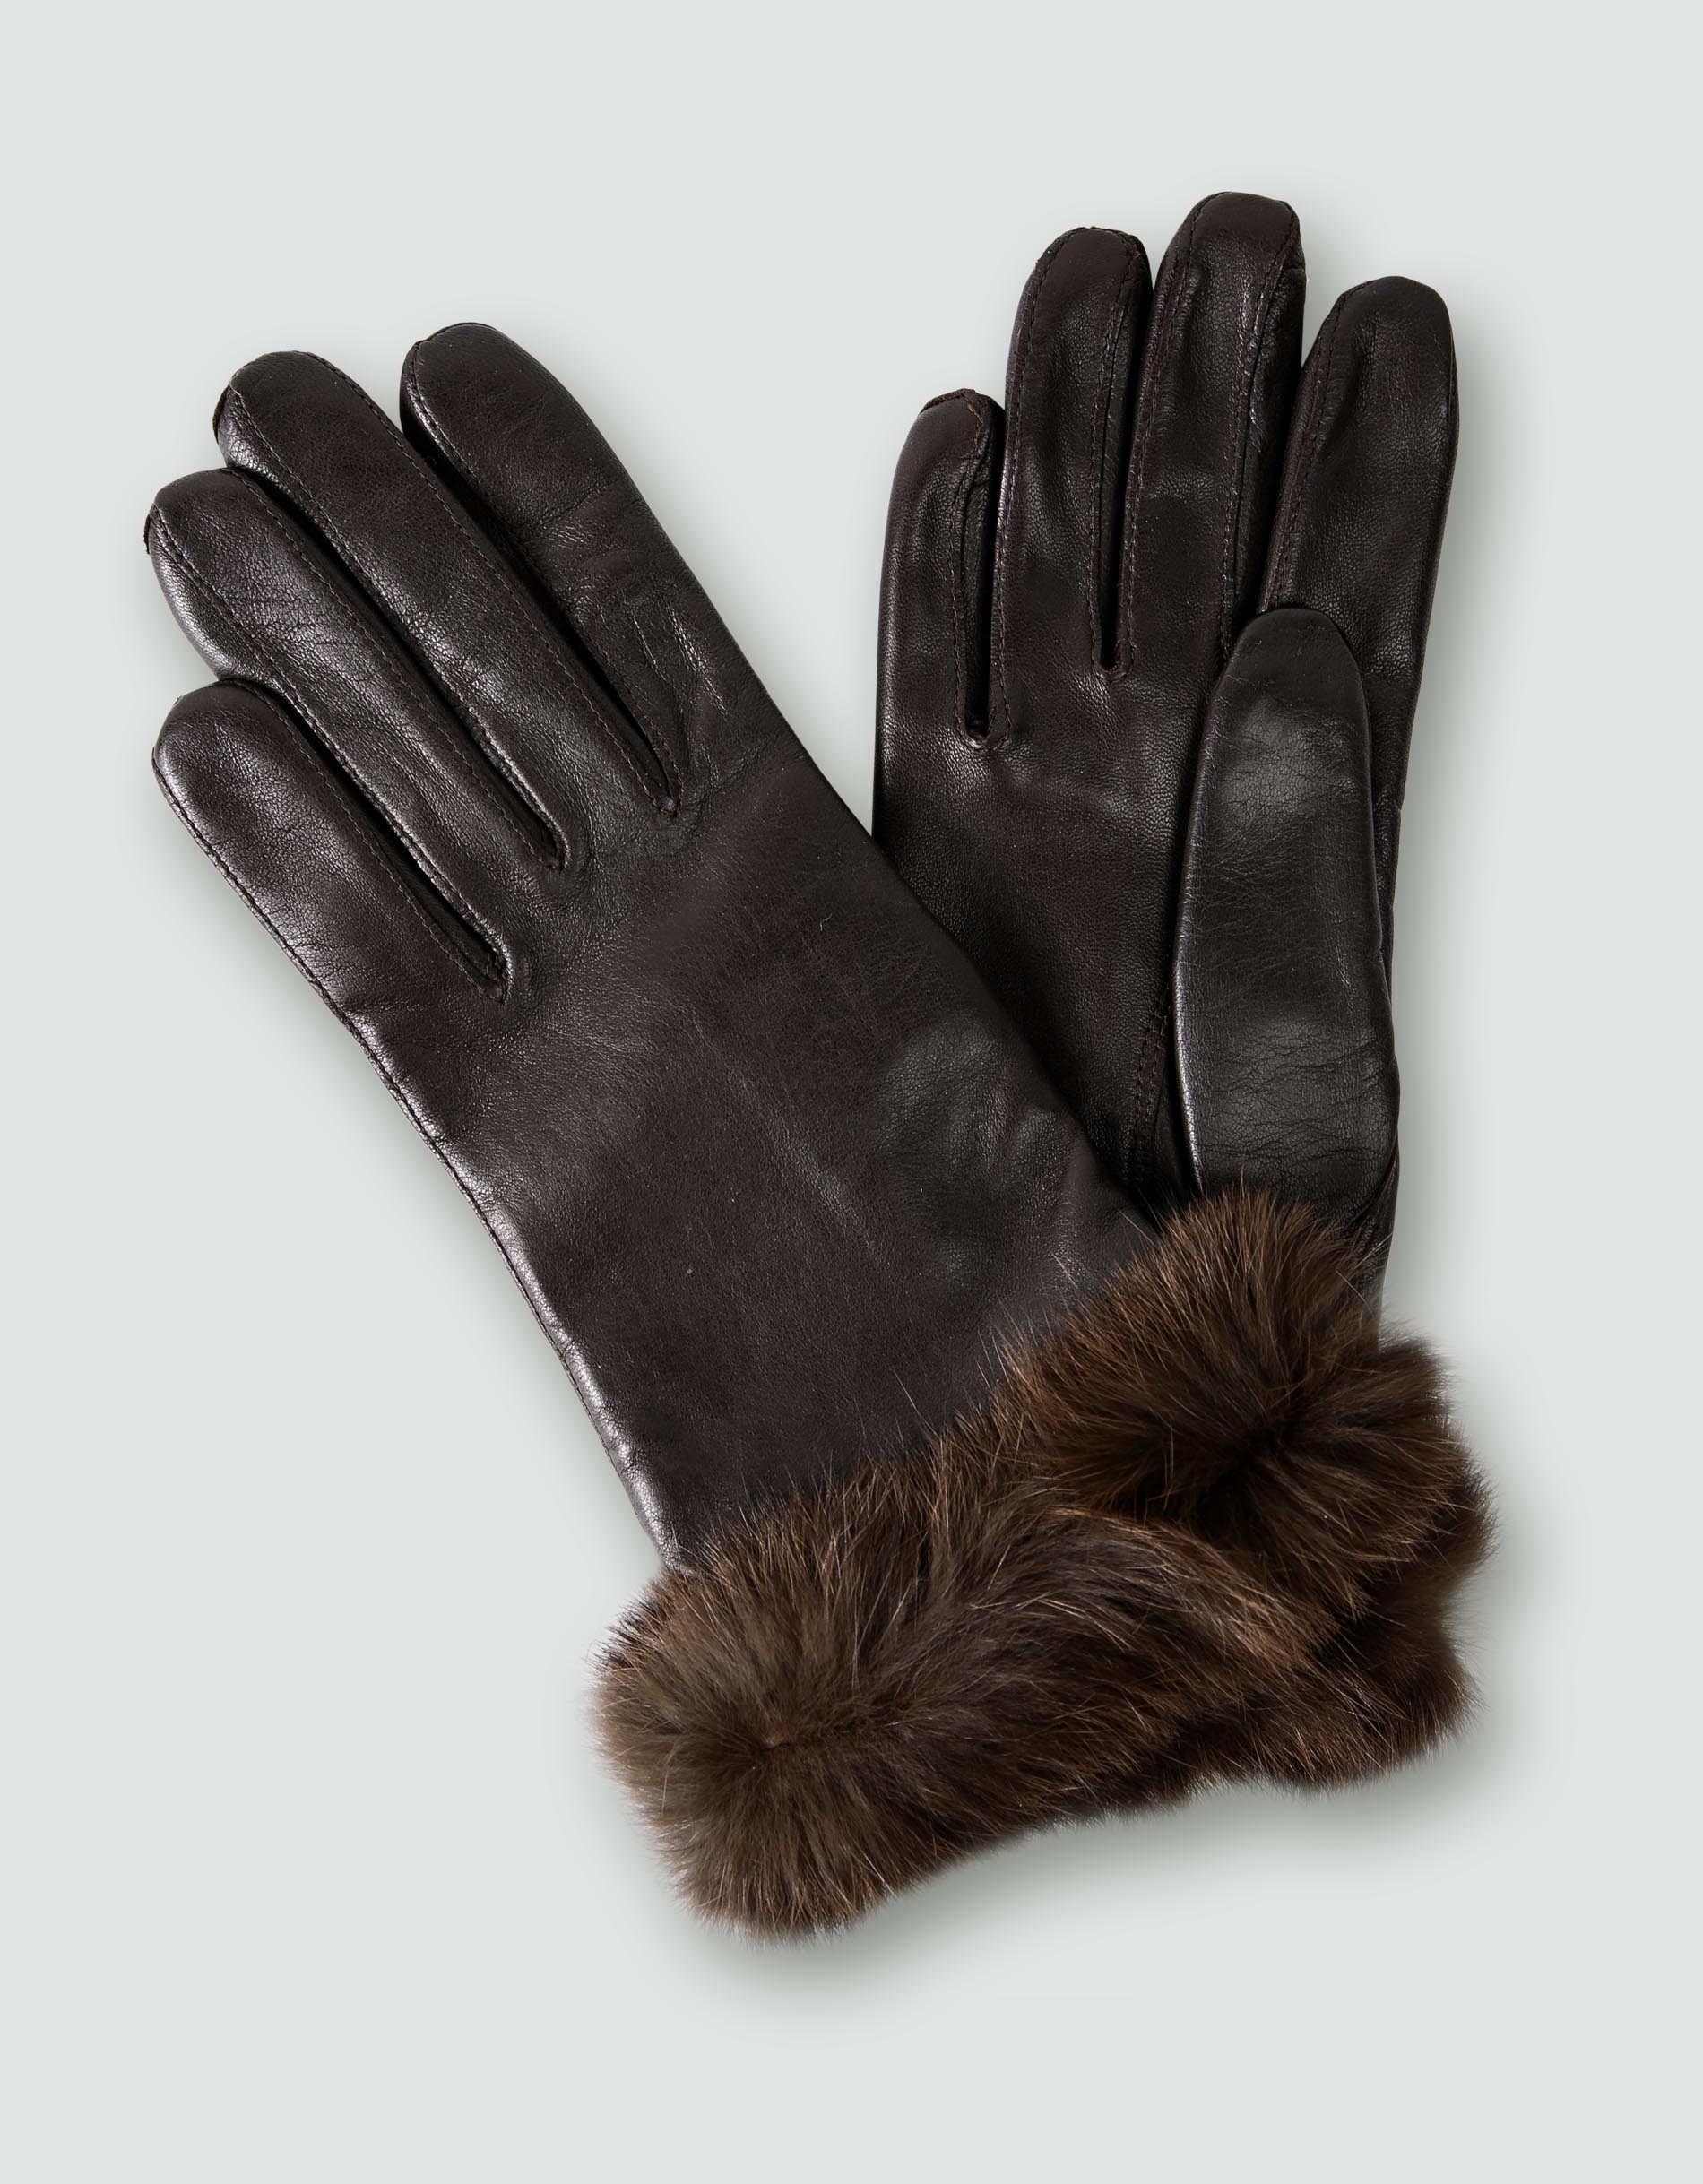 damen lederhandschuhe braun handschuhe. Black Bedroom Furniture Sets. Home Design Ideas